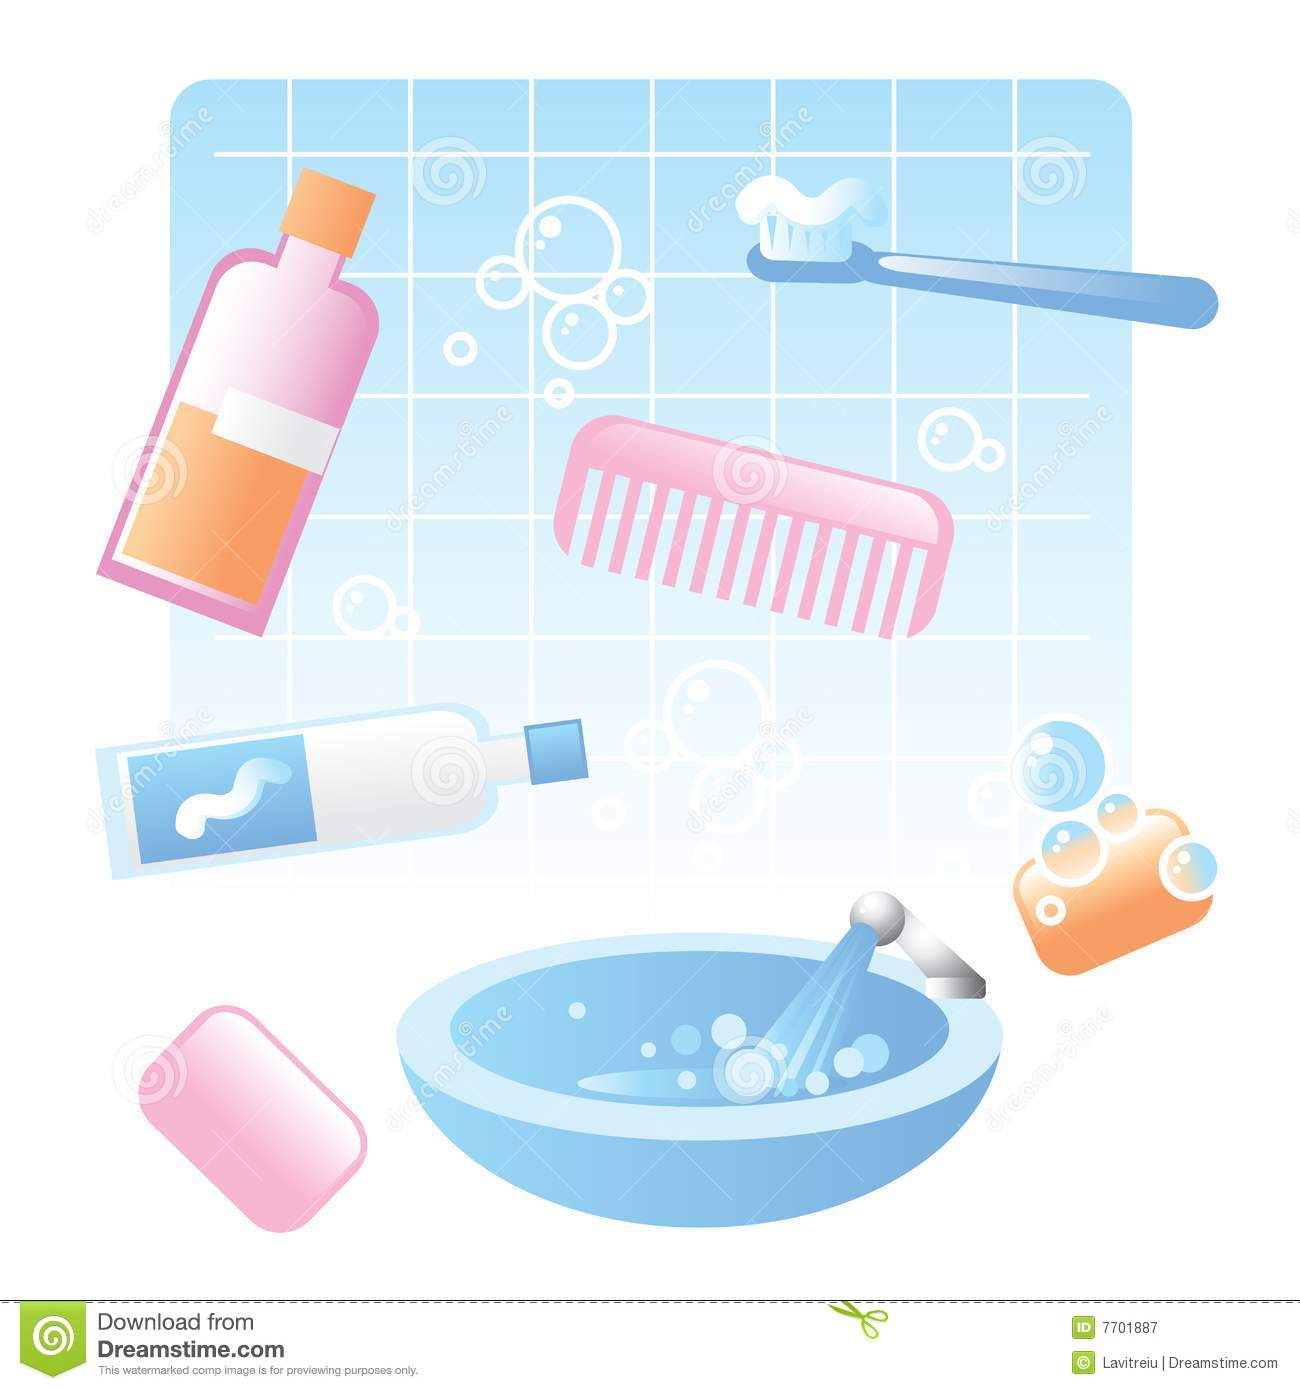 Bathtub clipart bathroom item. Items creative decoration cute